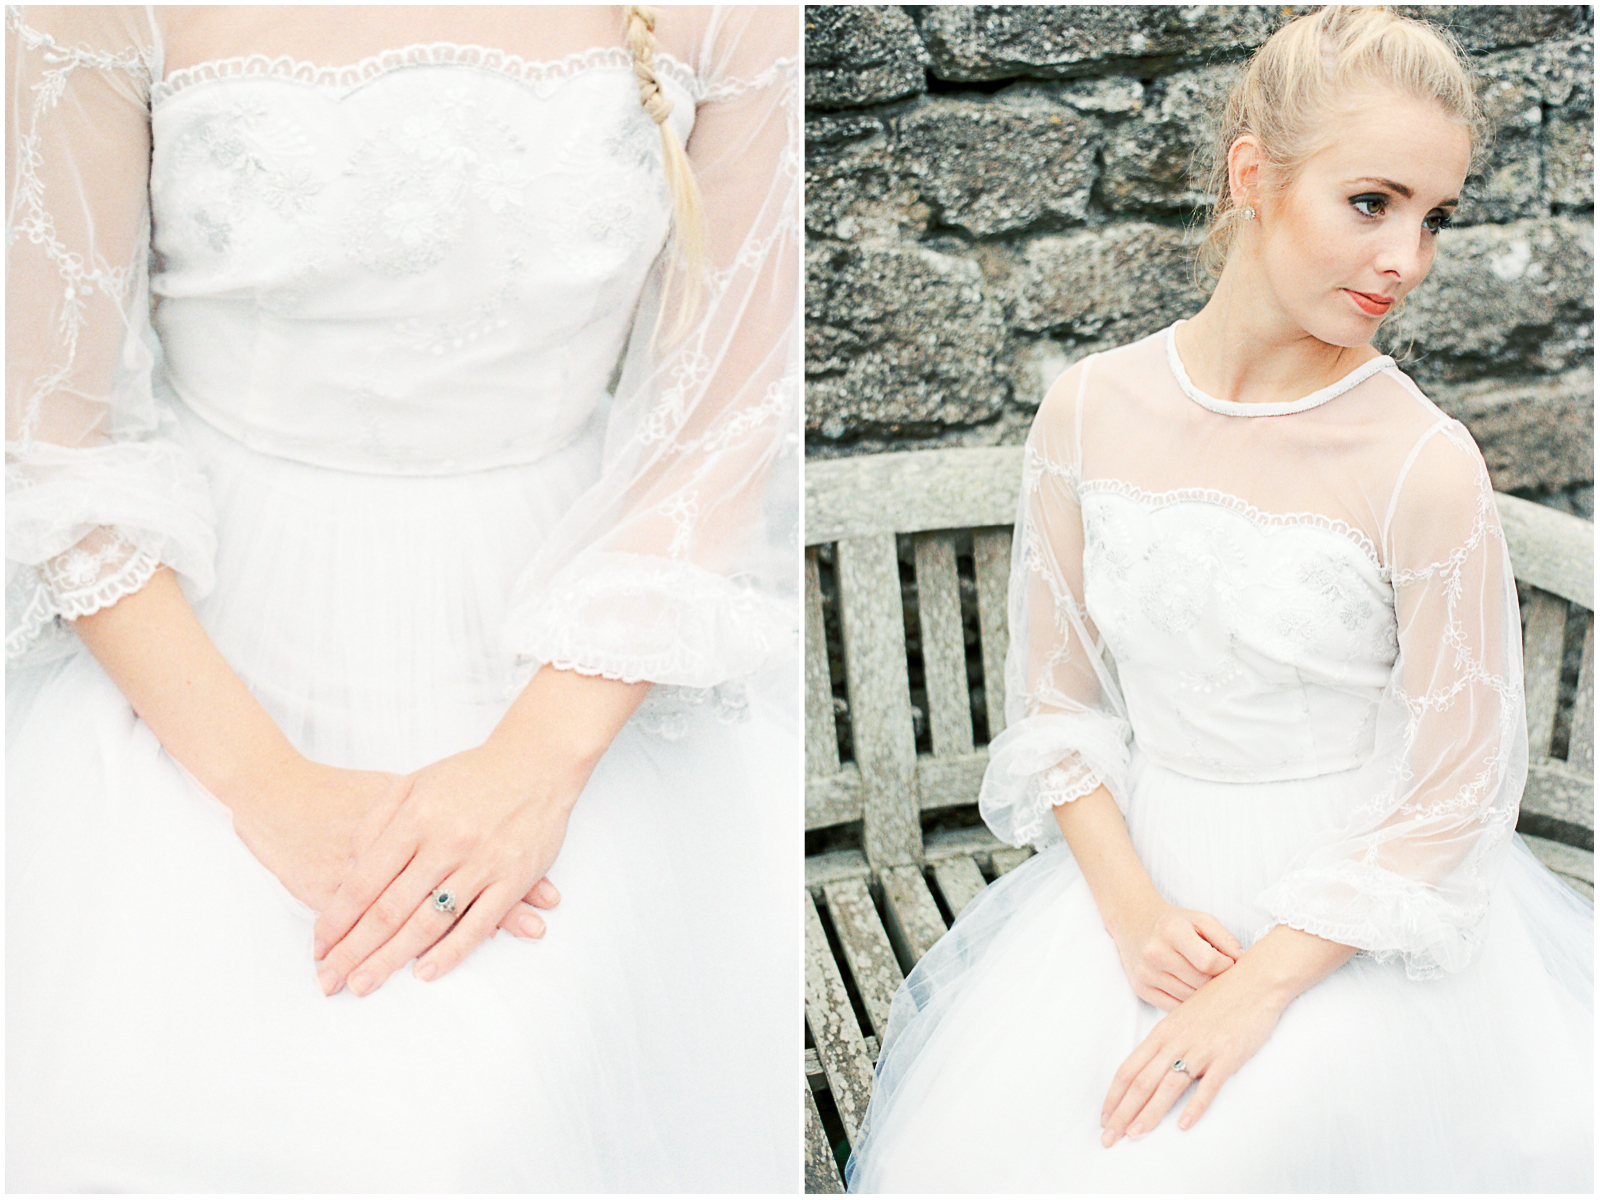 dorset-fine-art-wedding-photographer_amelia_carmencita_diptych6